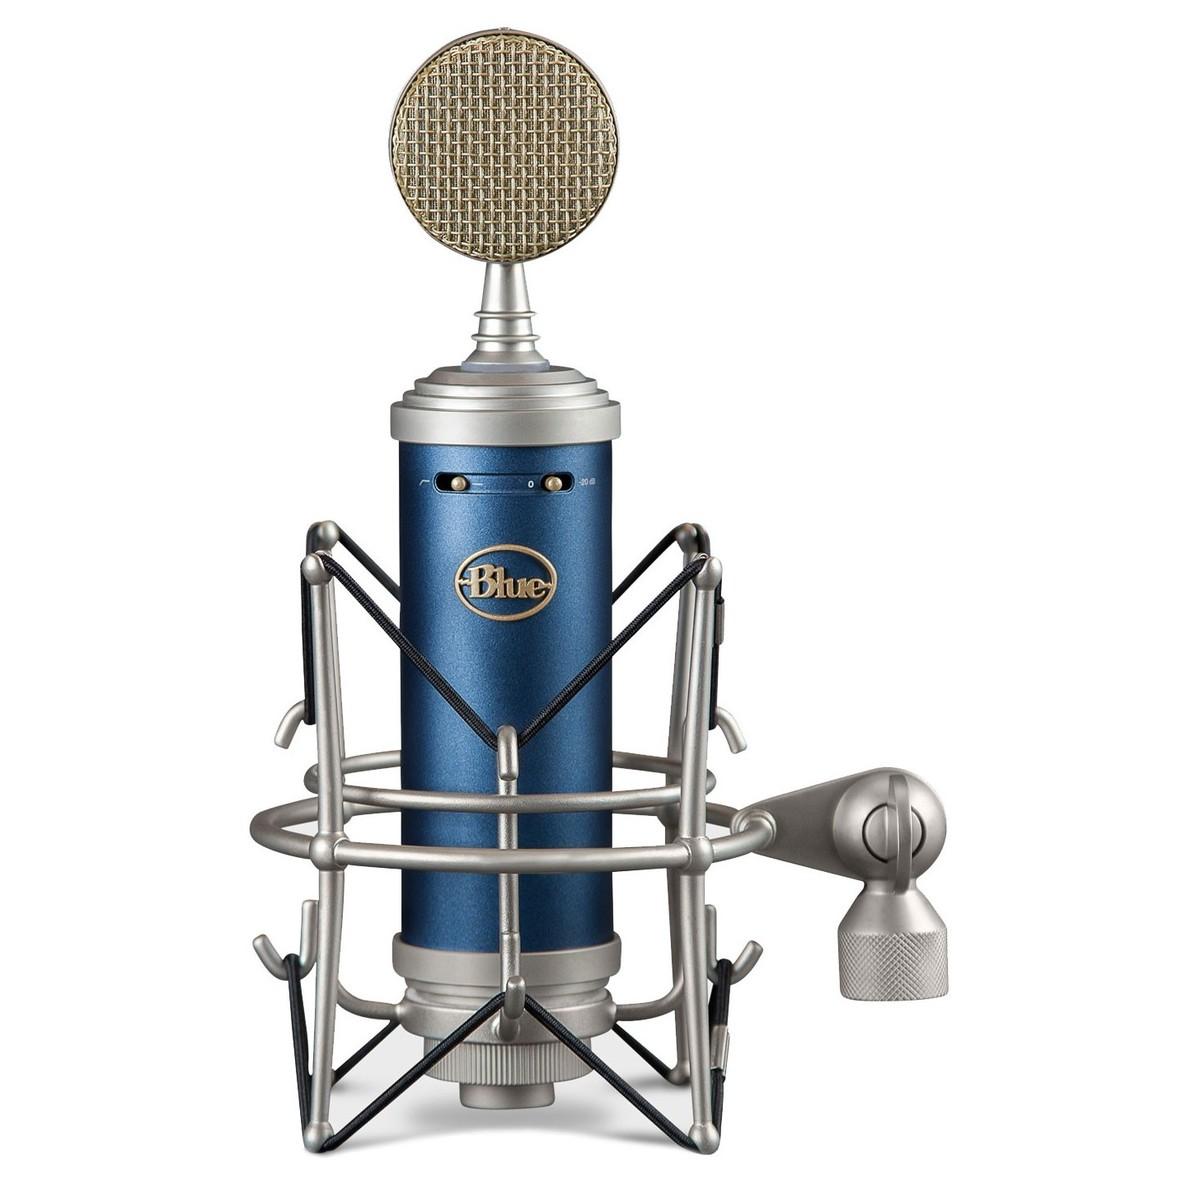 Mikrofontyper til salgs hos Gear4music Side 20